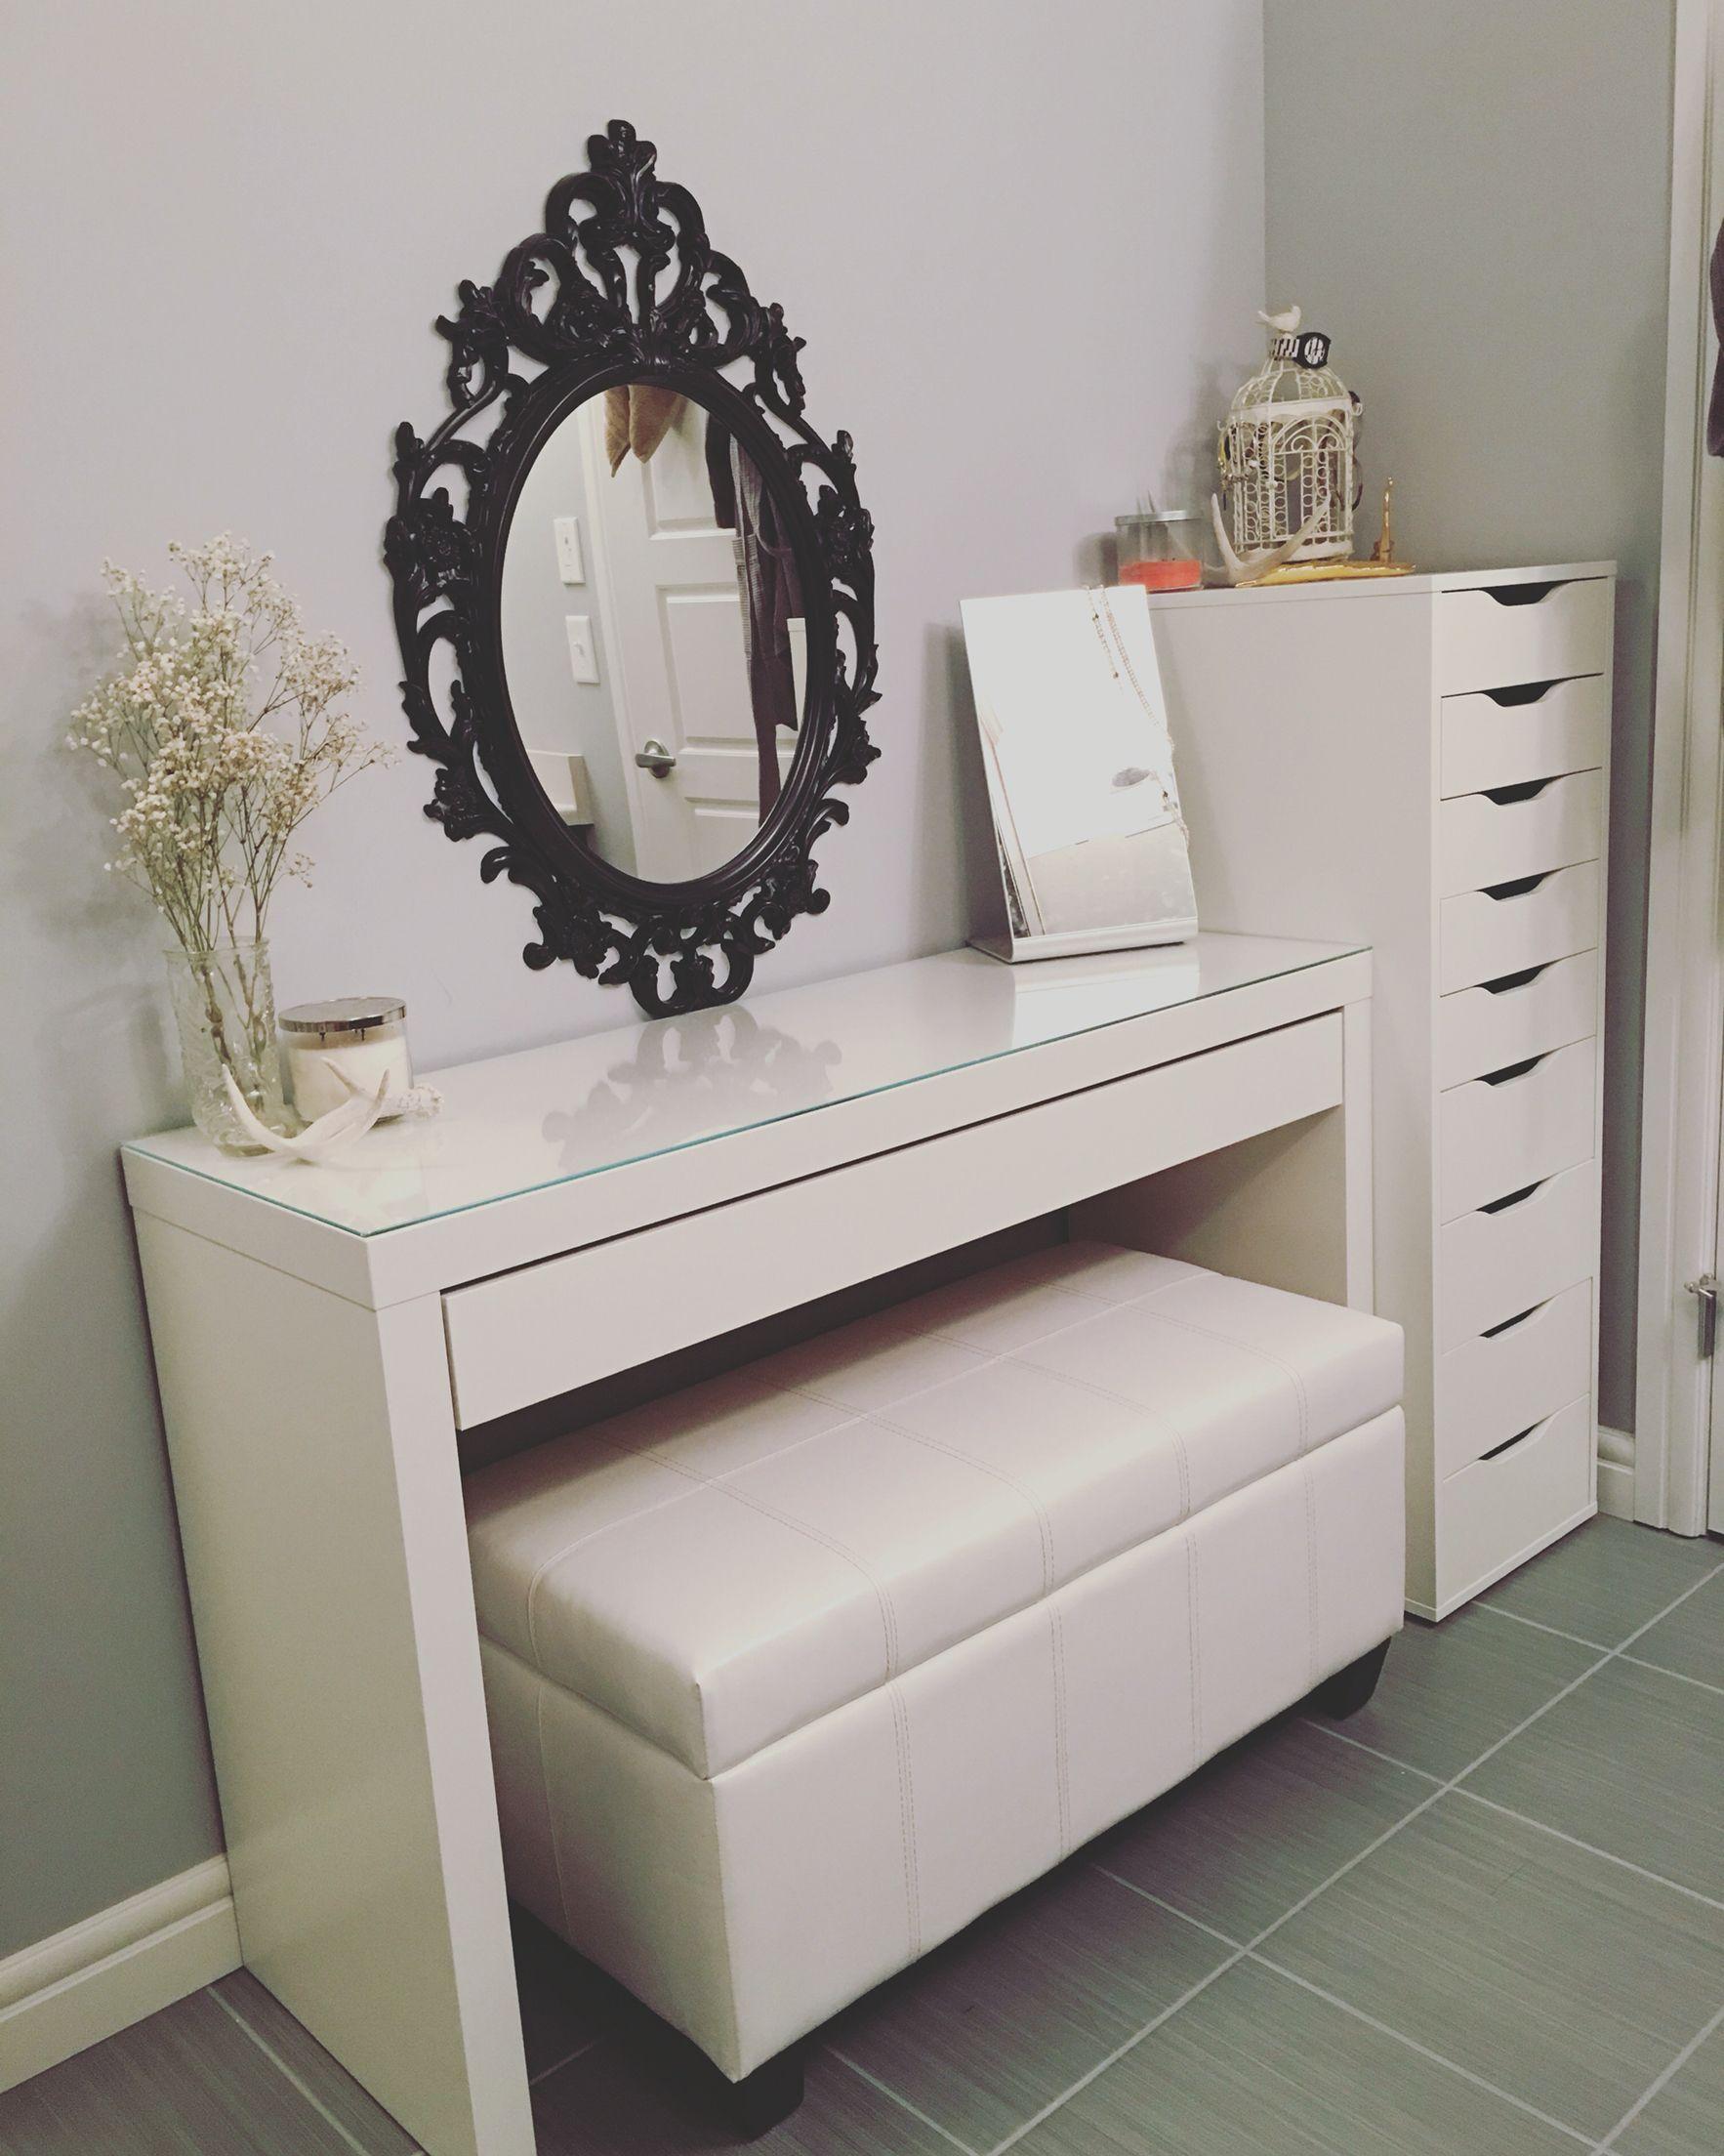 Updated vanity malm desk ikea alex drawers ikea bella storage